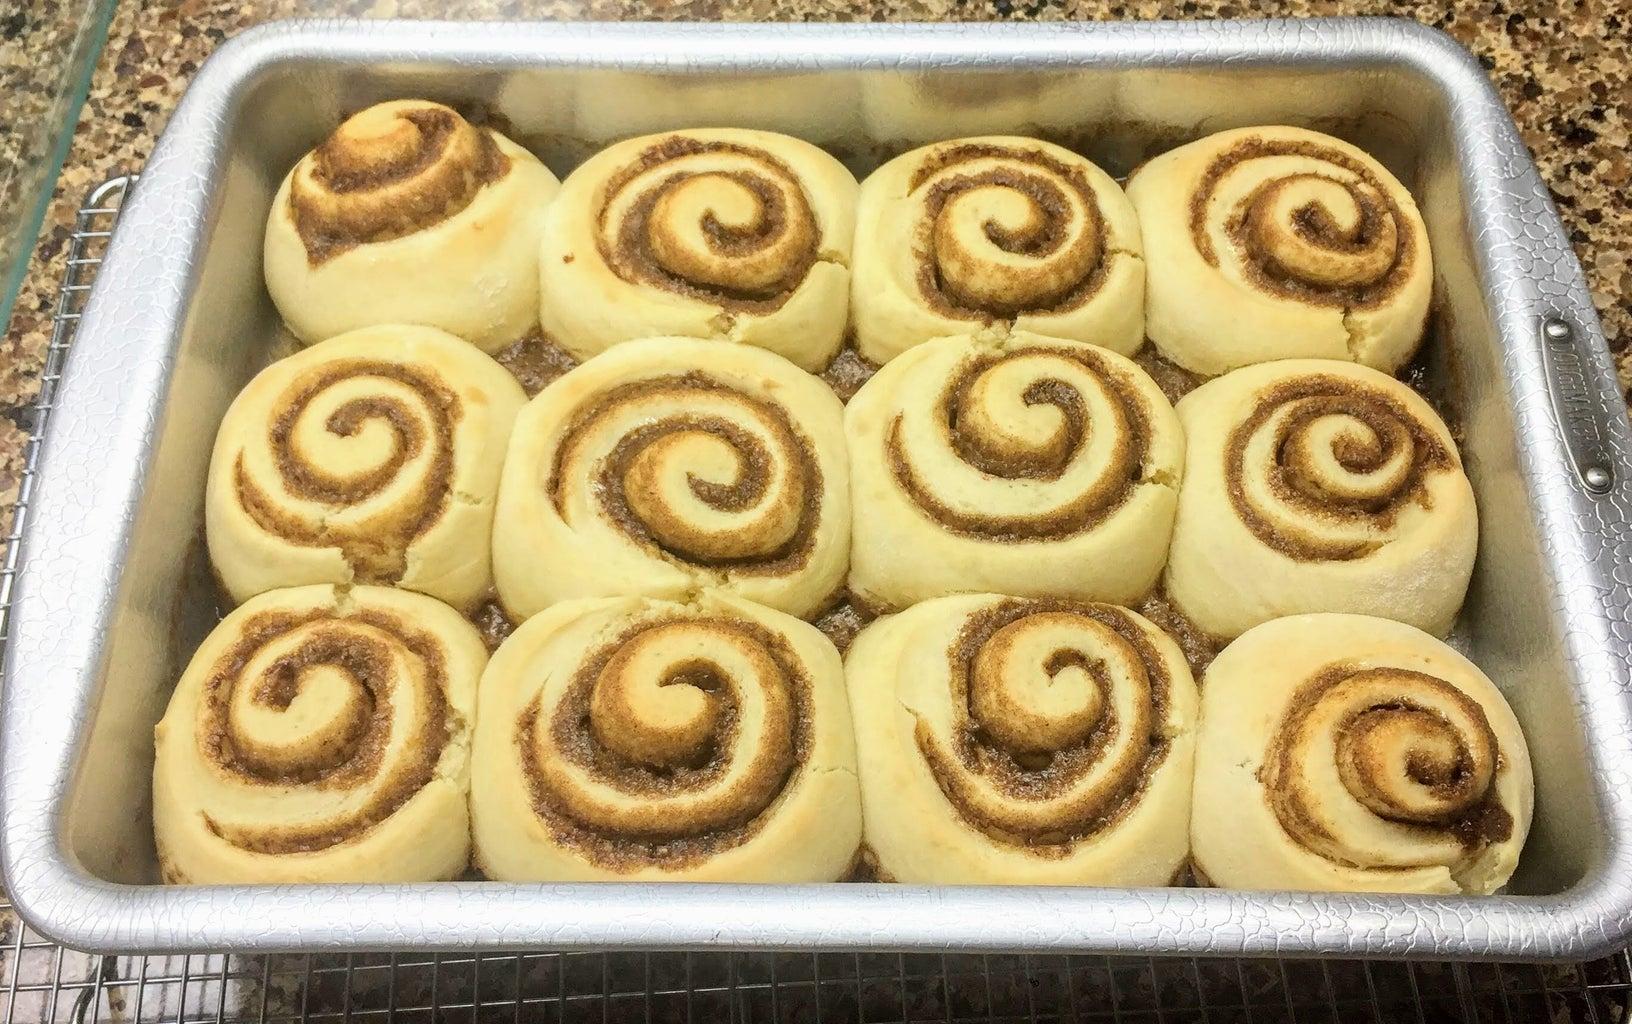 Glaze Your Cinnamon Rolls and Enjoy!